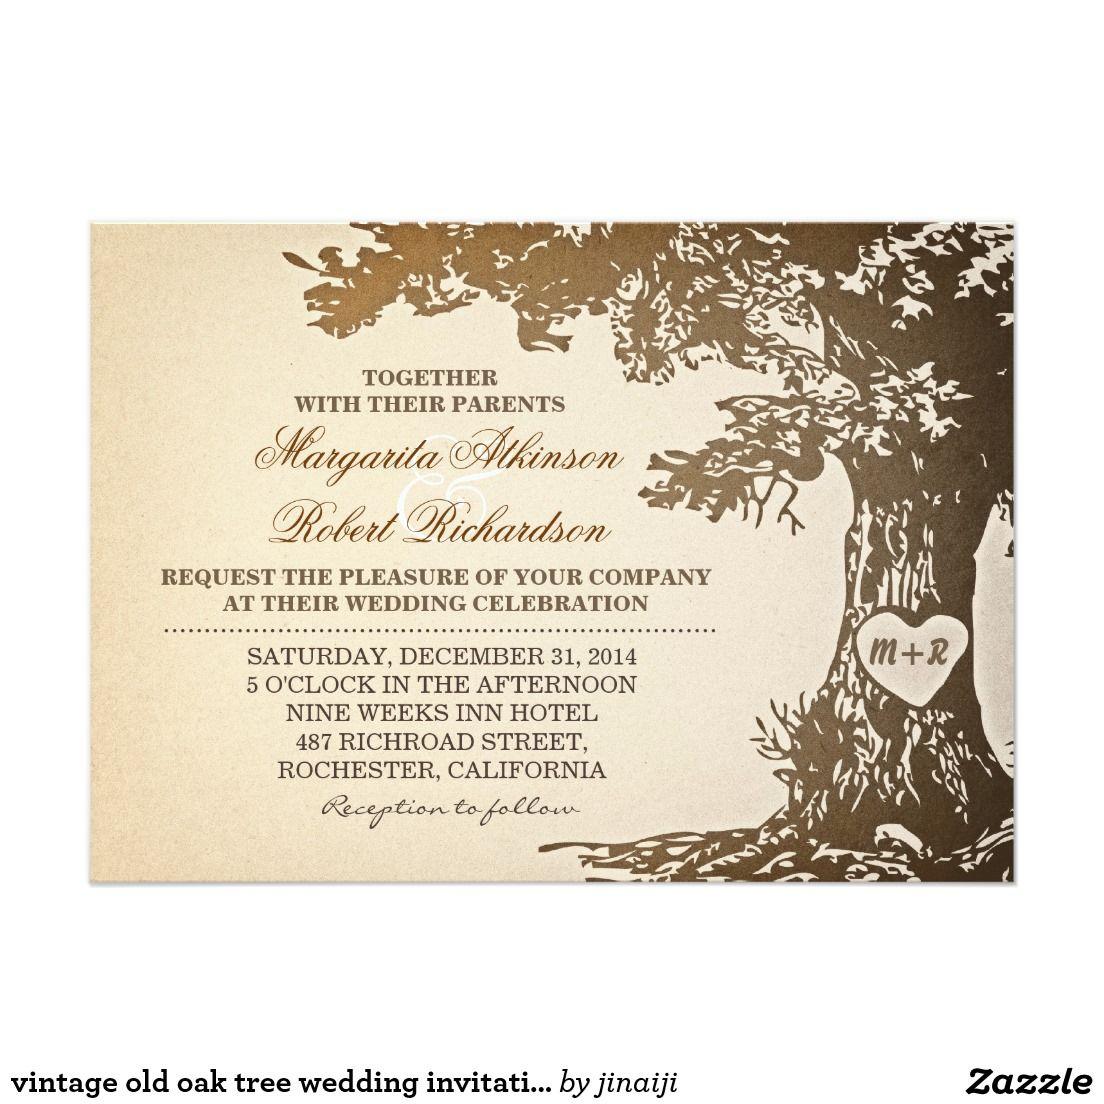 Vintage old oak tree wedding invitations oak tree weddings and vintage old oak tree wedding invitations stopboris Gallery